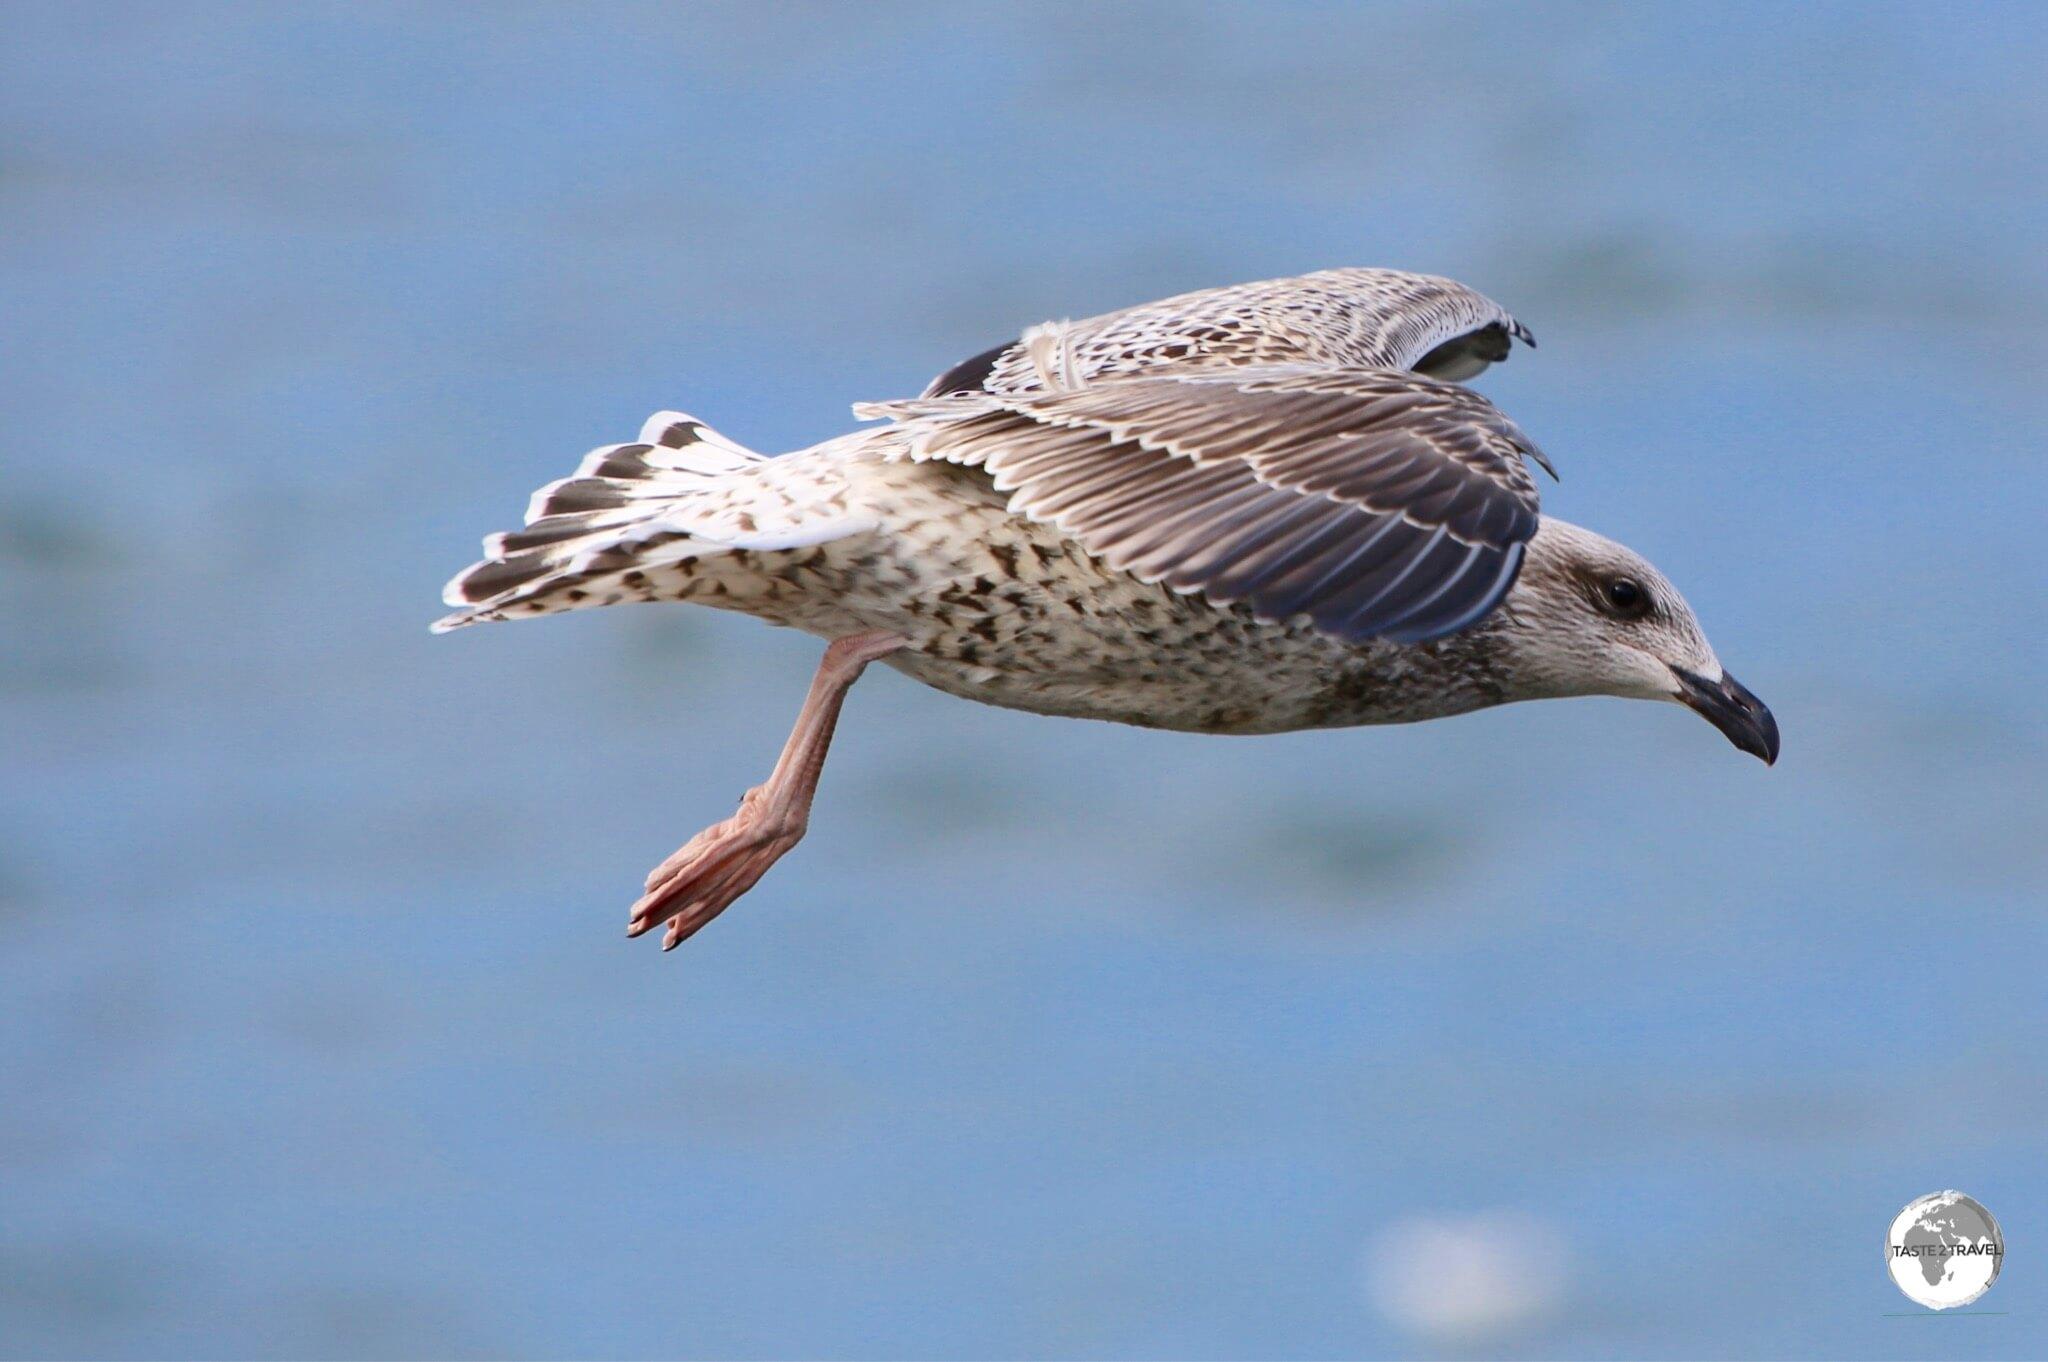 Icleandic seagull flying at Ólafsvík.